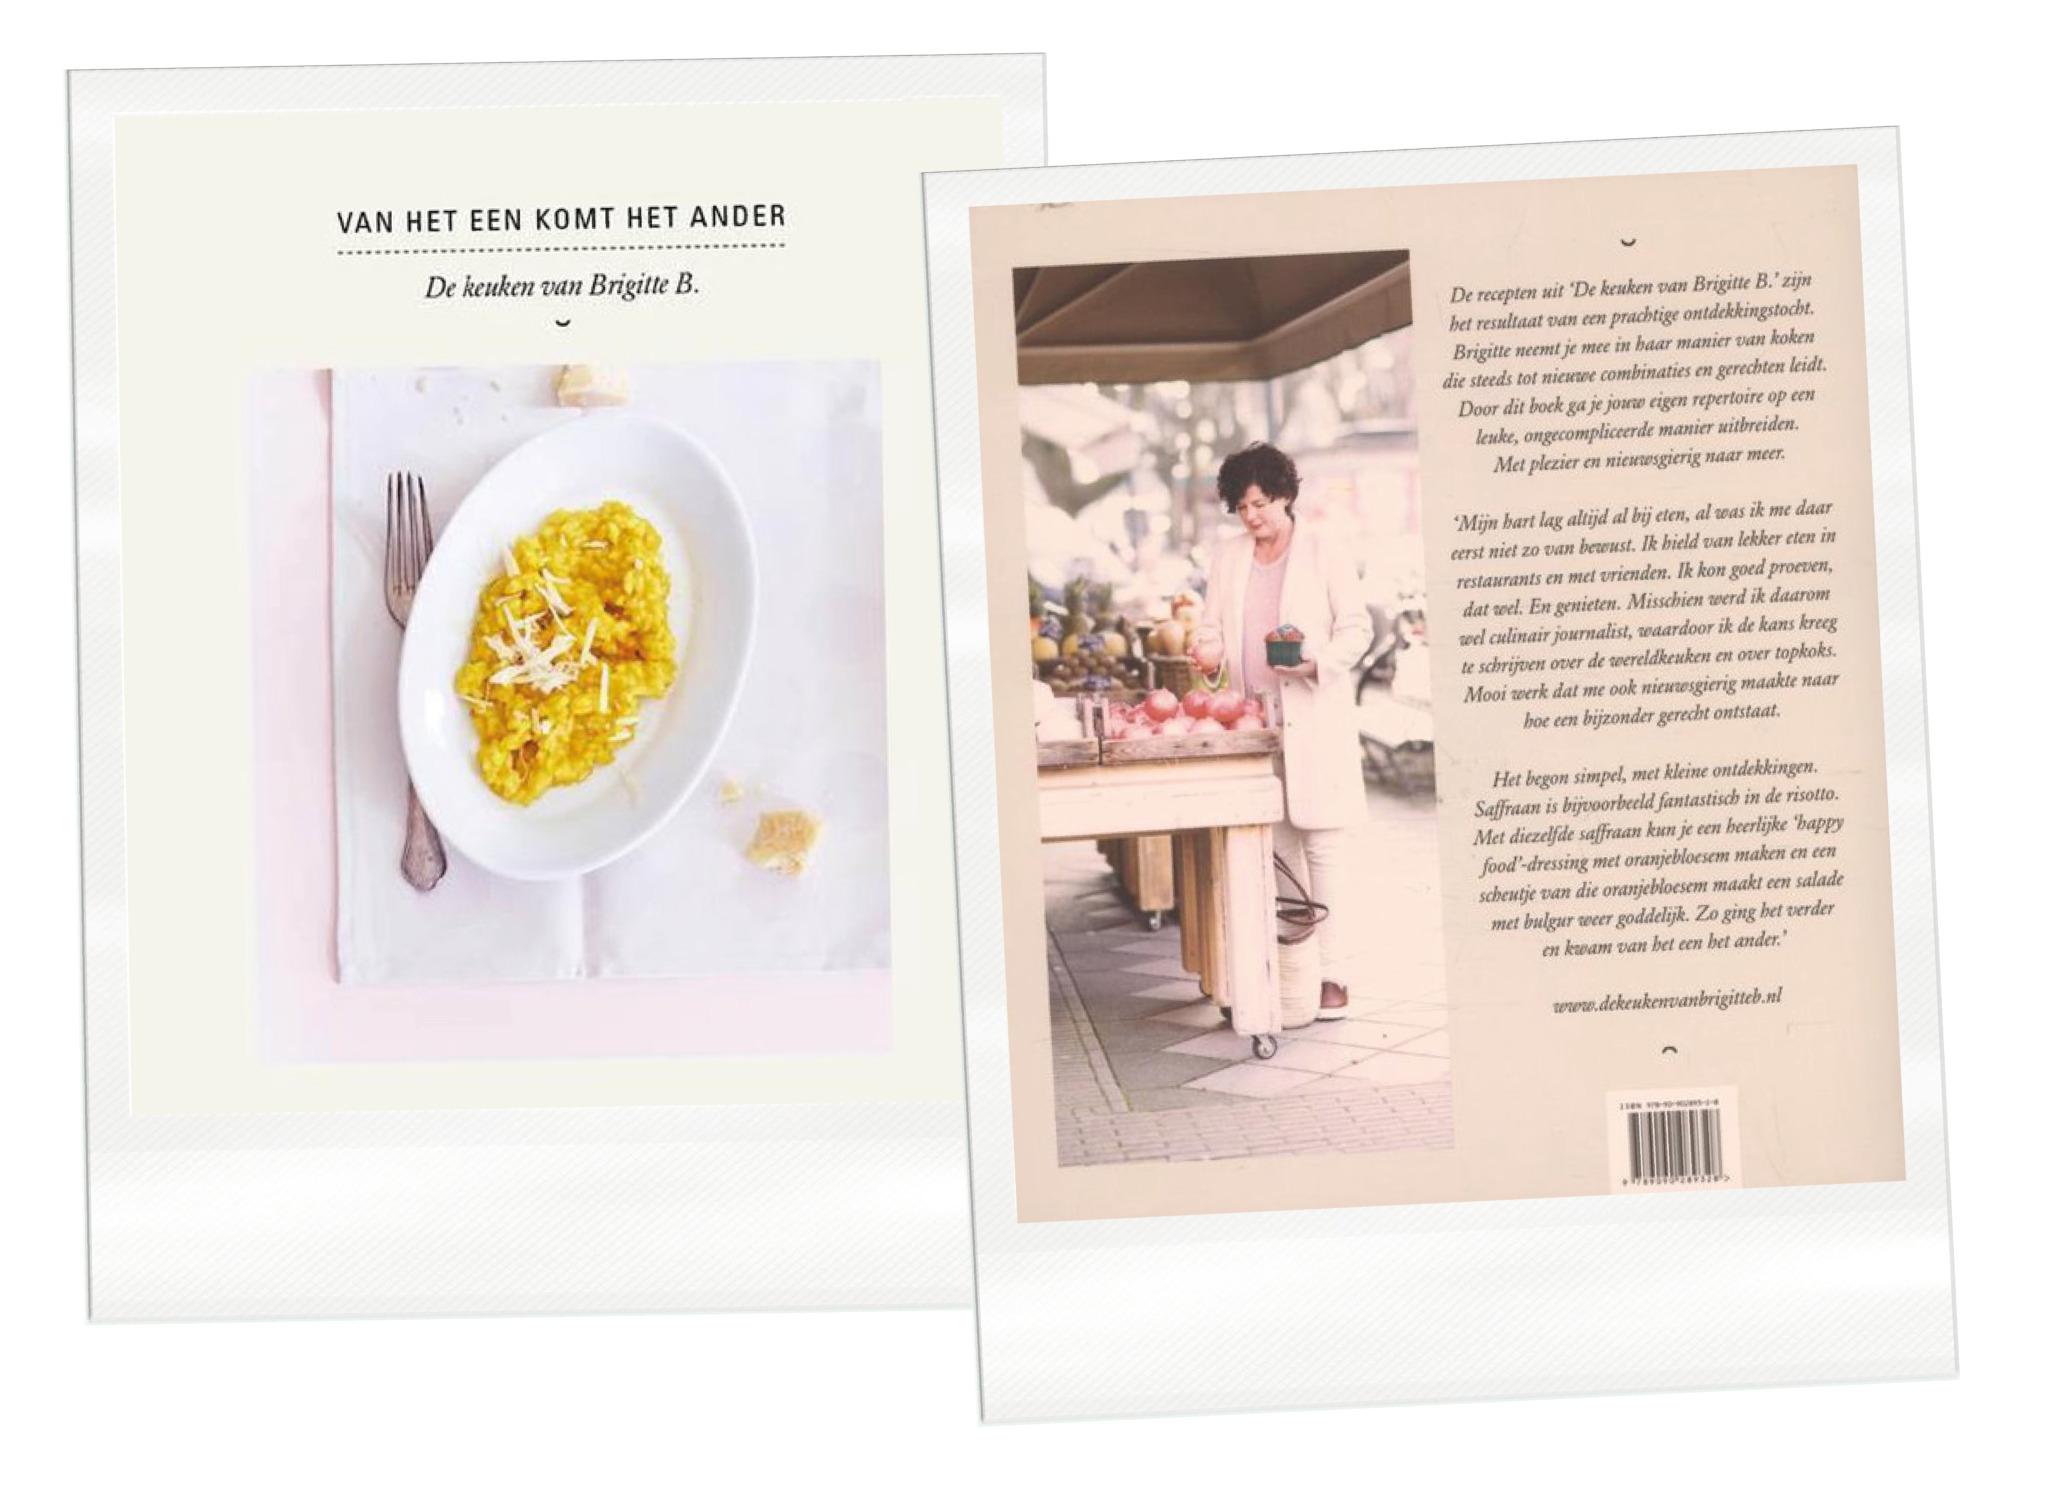 kookboek van brigitte bormans